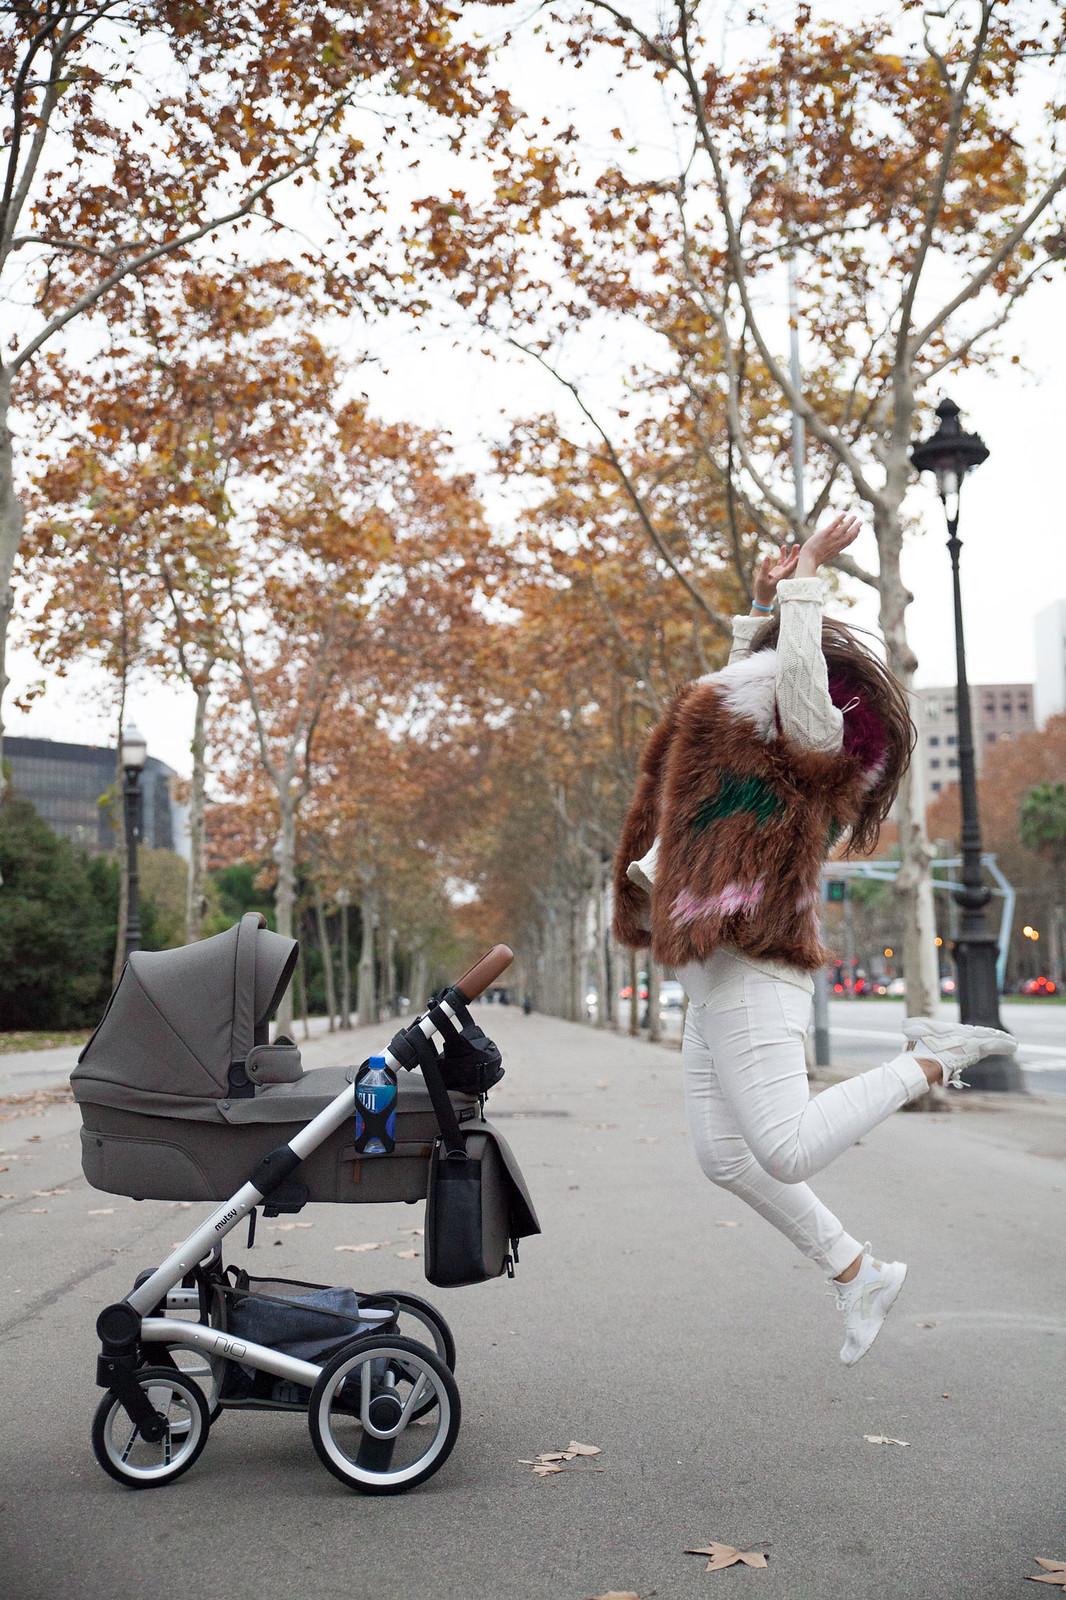 06_LUK_primer_paseo_recien_nacido_mutsy_theguestgirl_perfil_mama_influencer_barcelona_españa